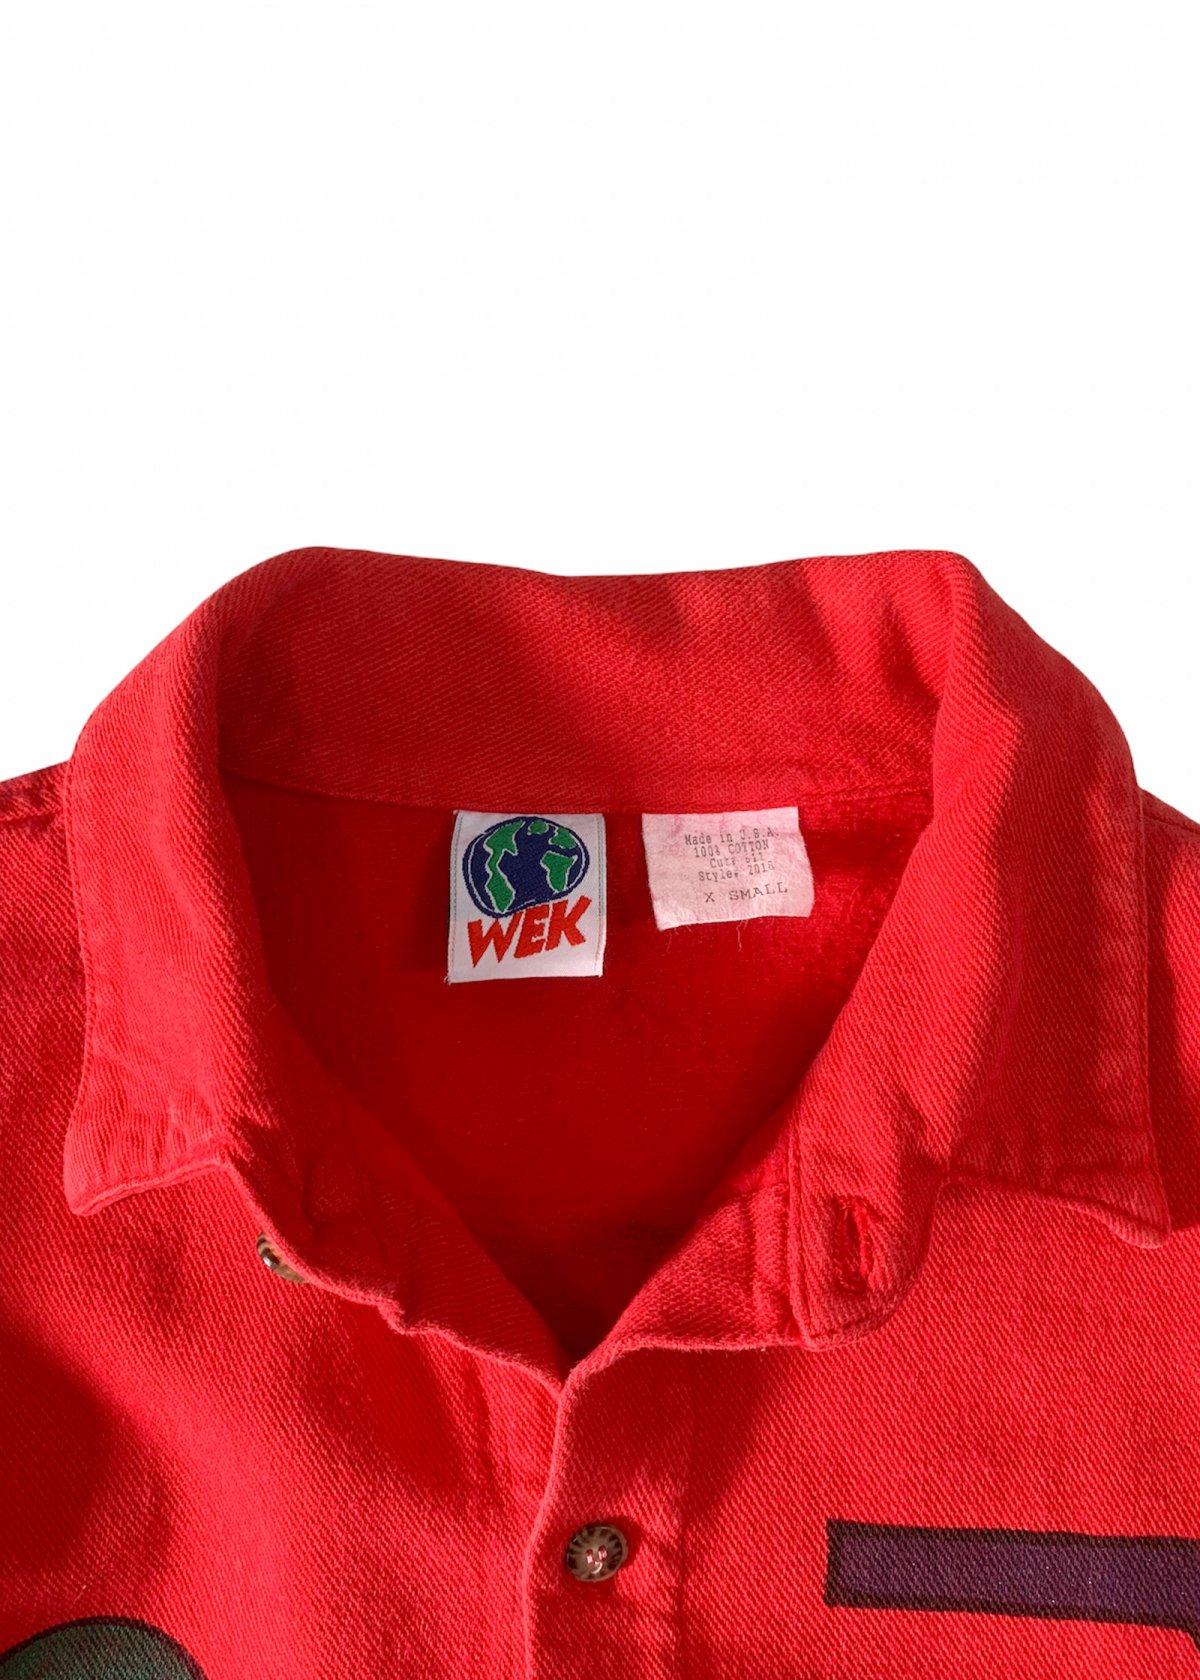 "I&I 古着 通販 ""WEK"" Hand Painted L/S Shirt 詳細画像6"